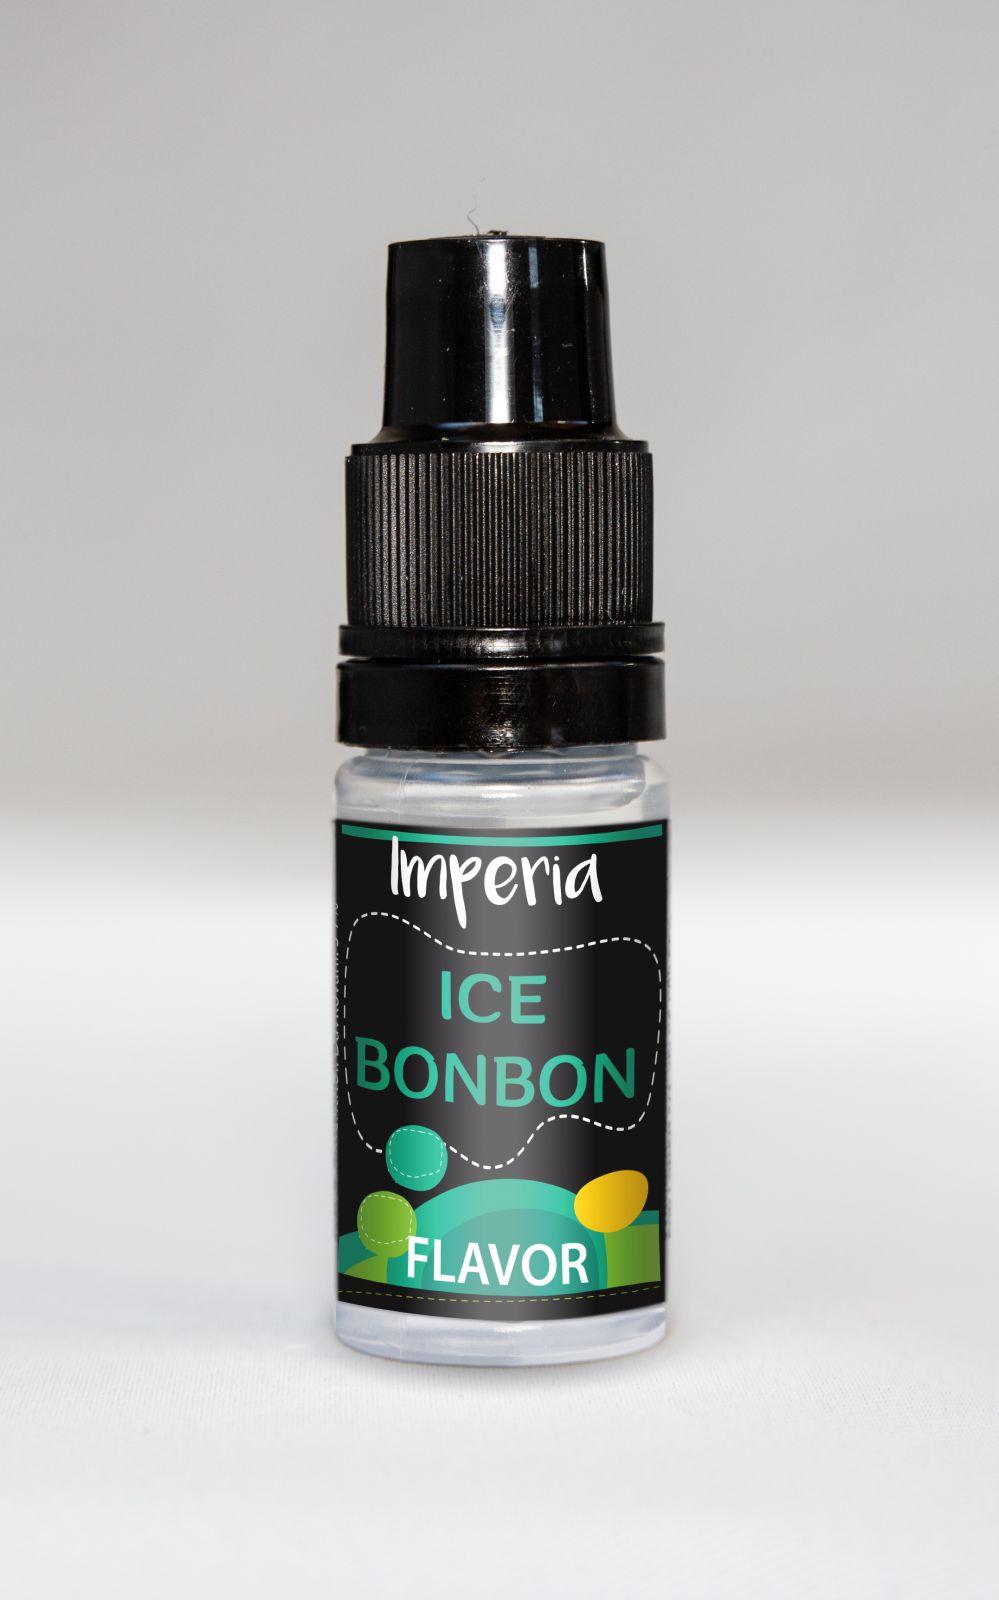 ICE BONBON / Ledové bonbóny - Aroma Imperia Black Label Boudoir Samadhi s.r.o.